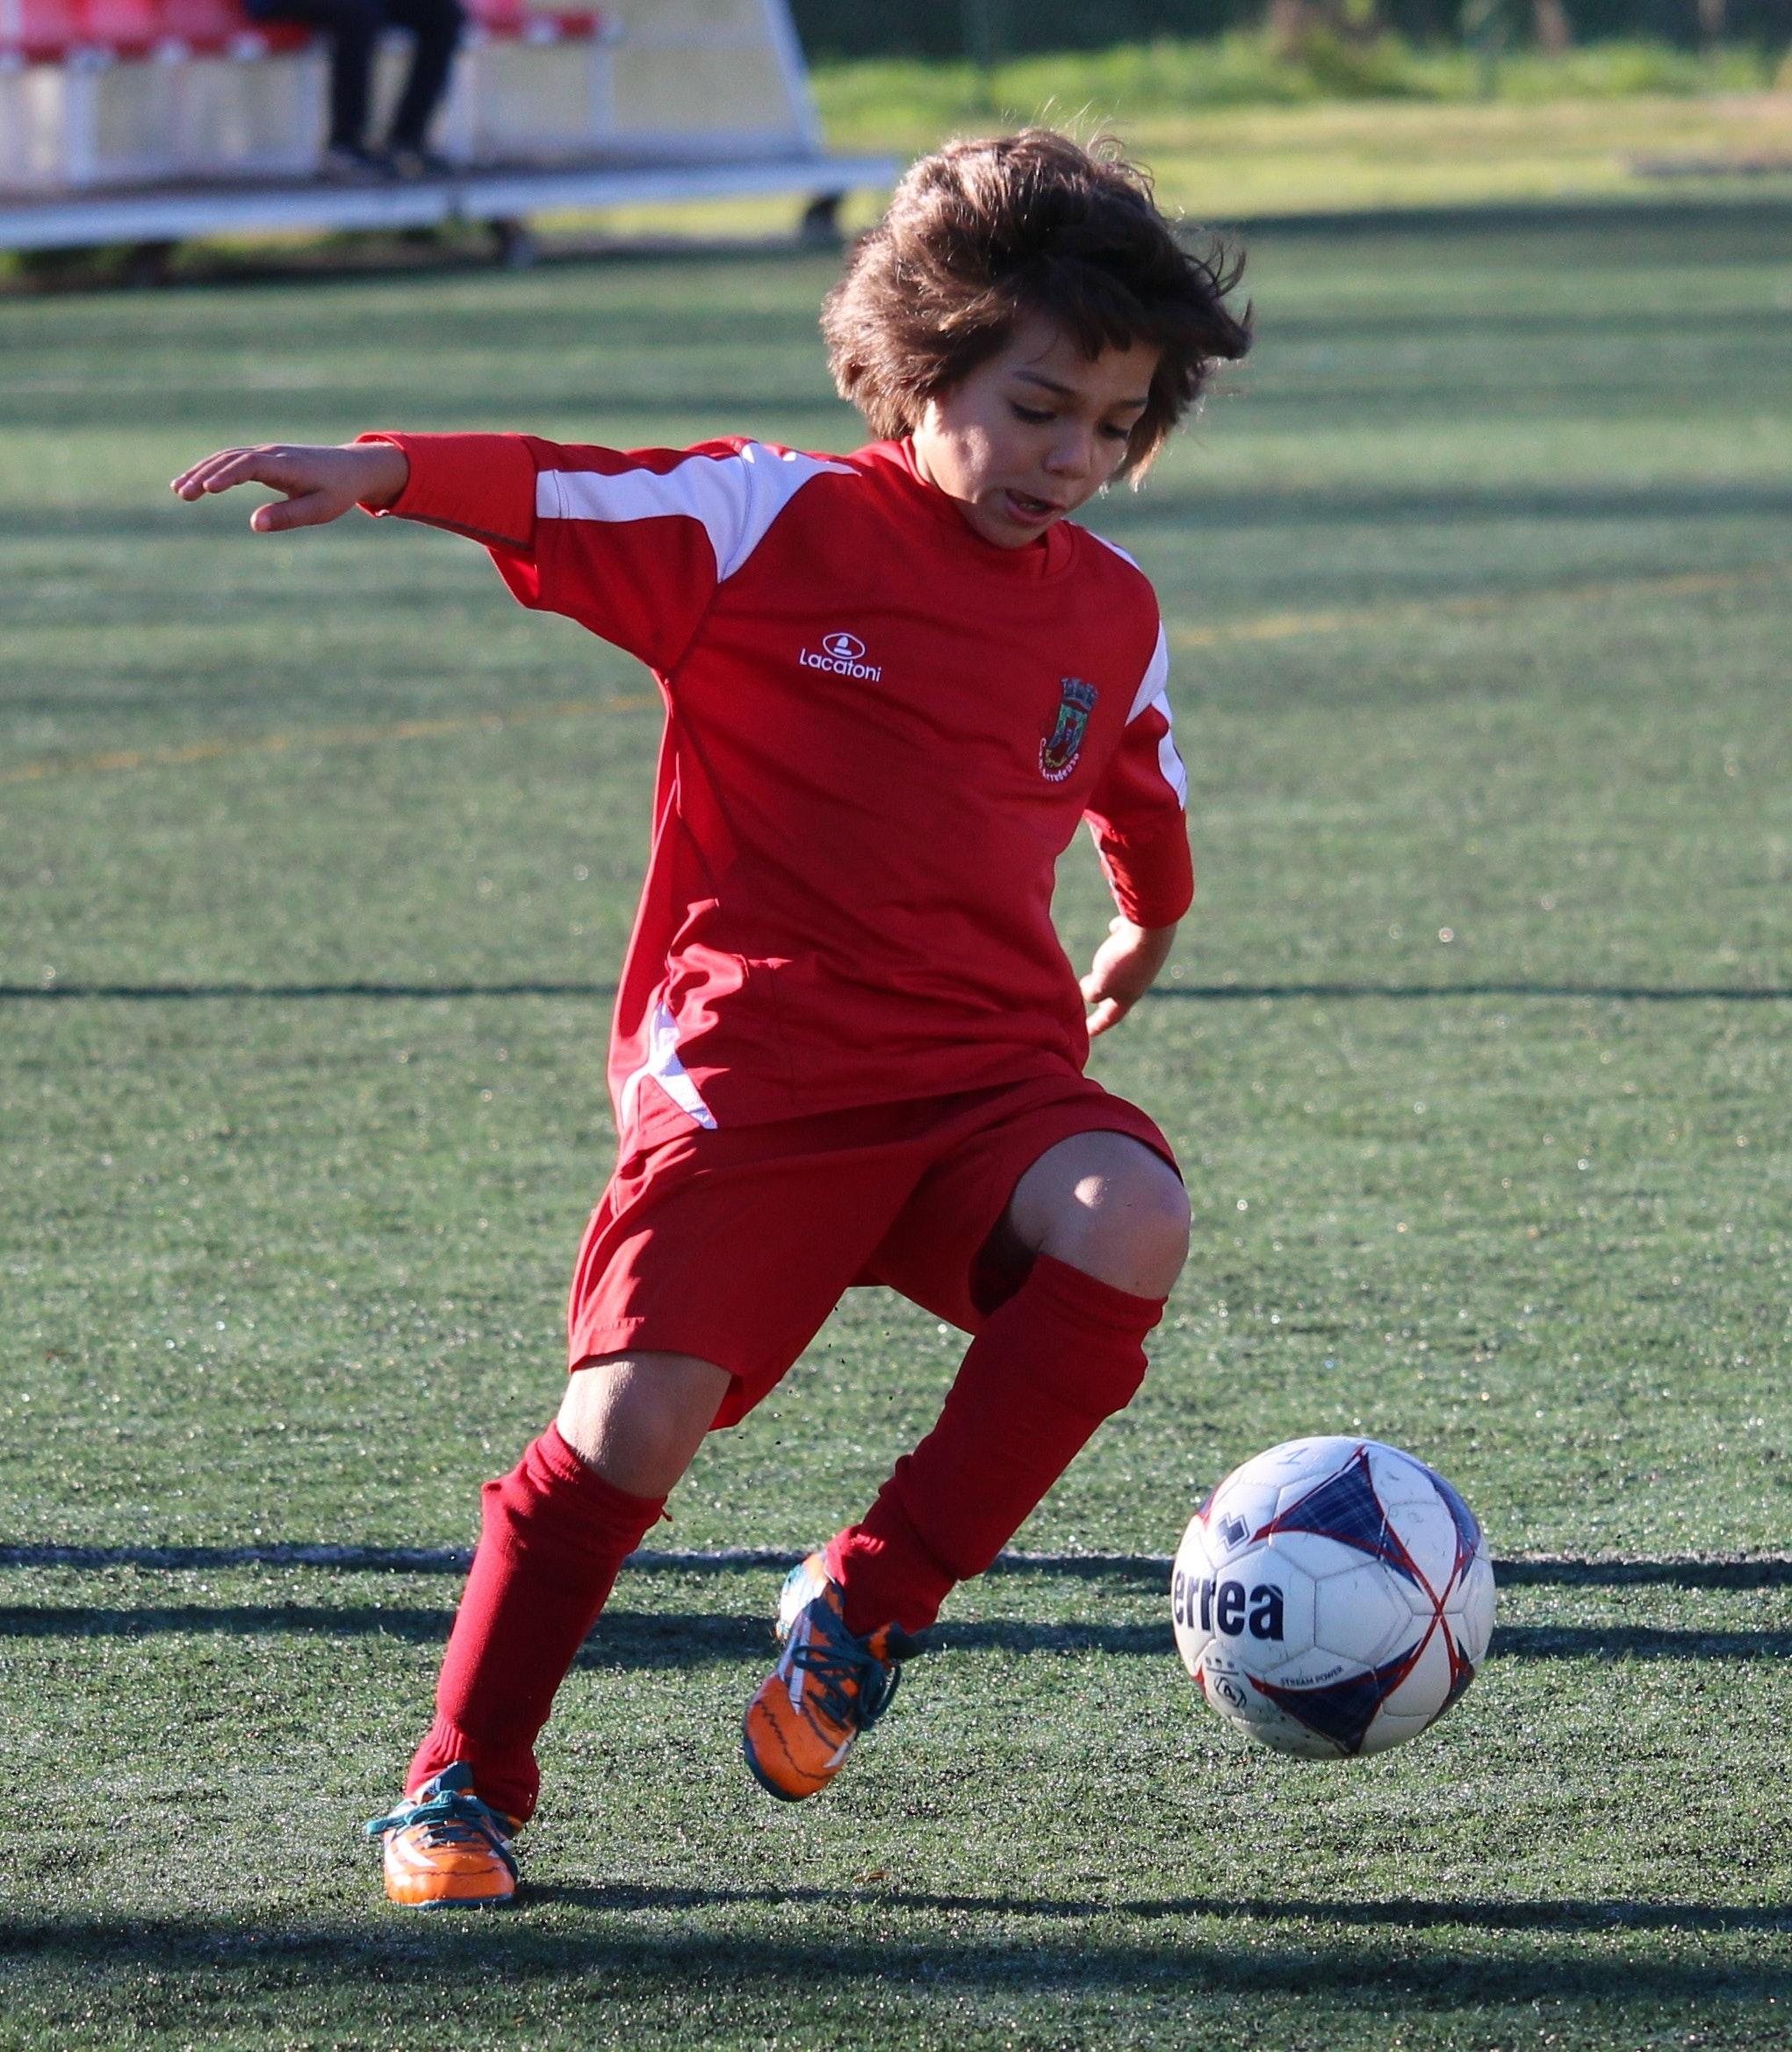 free stock photo of child football play